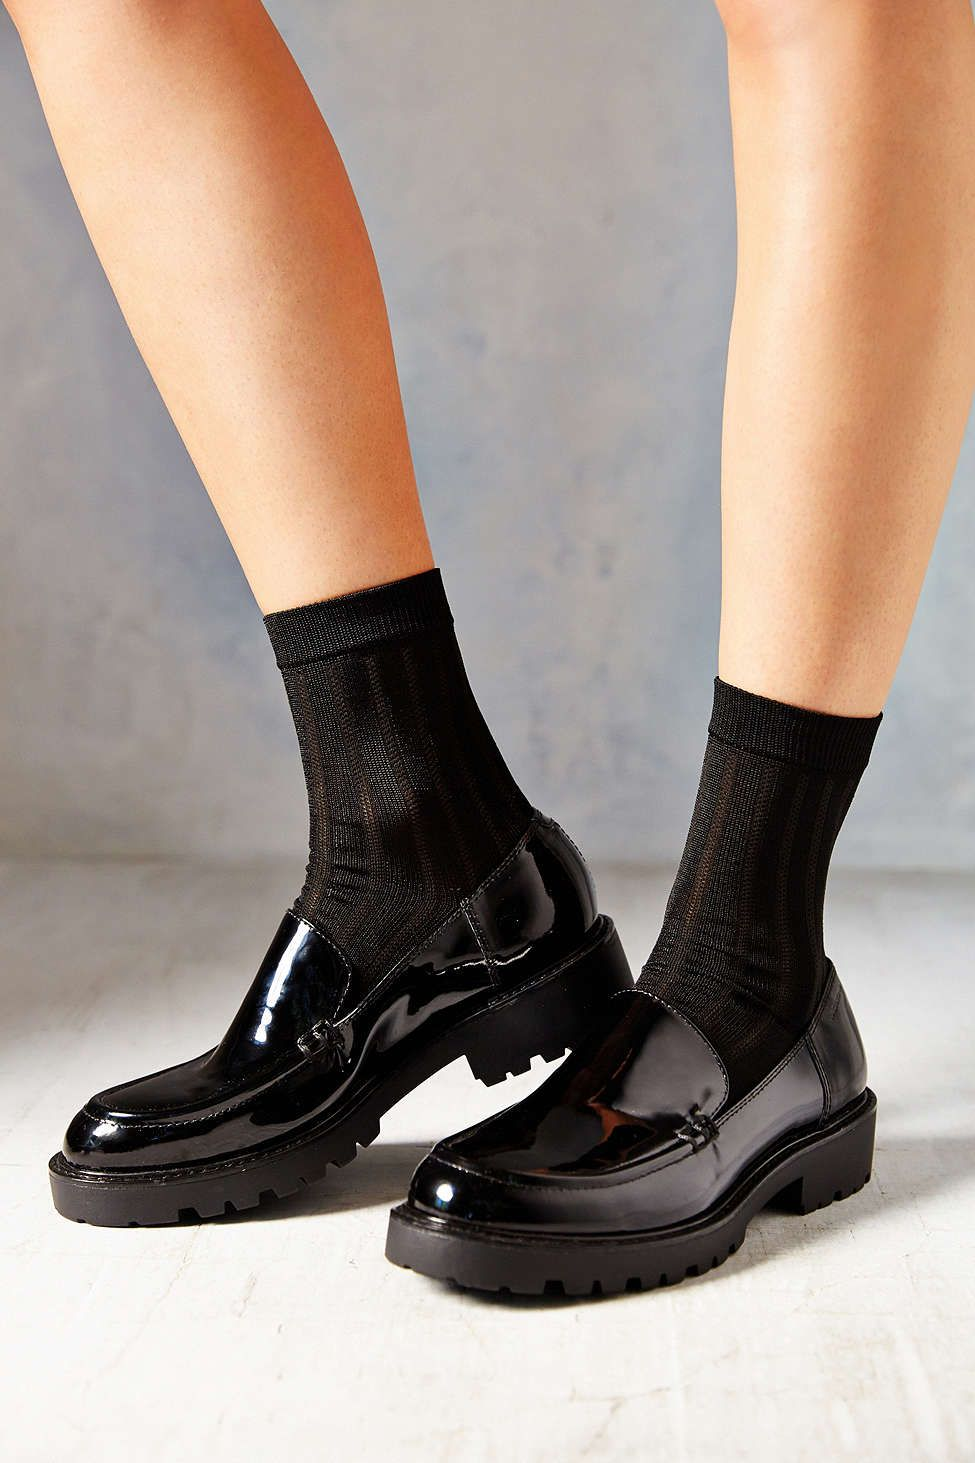 Vagabond Kenova Patent Loafer - Urban